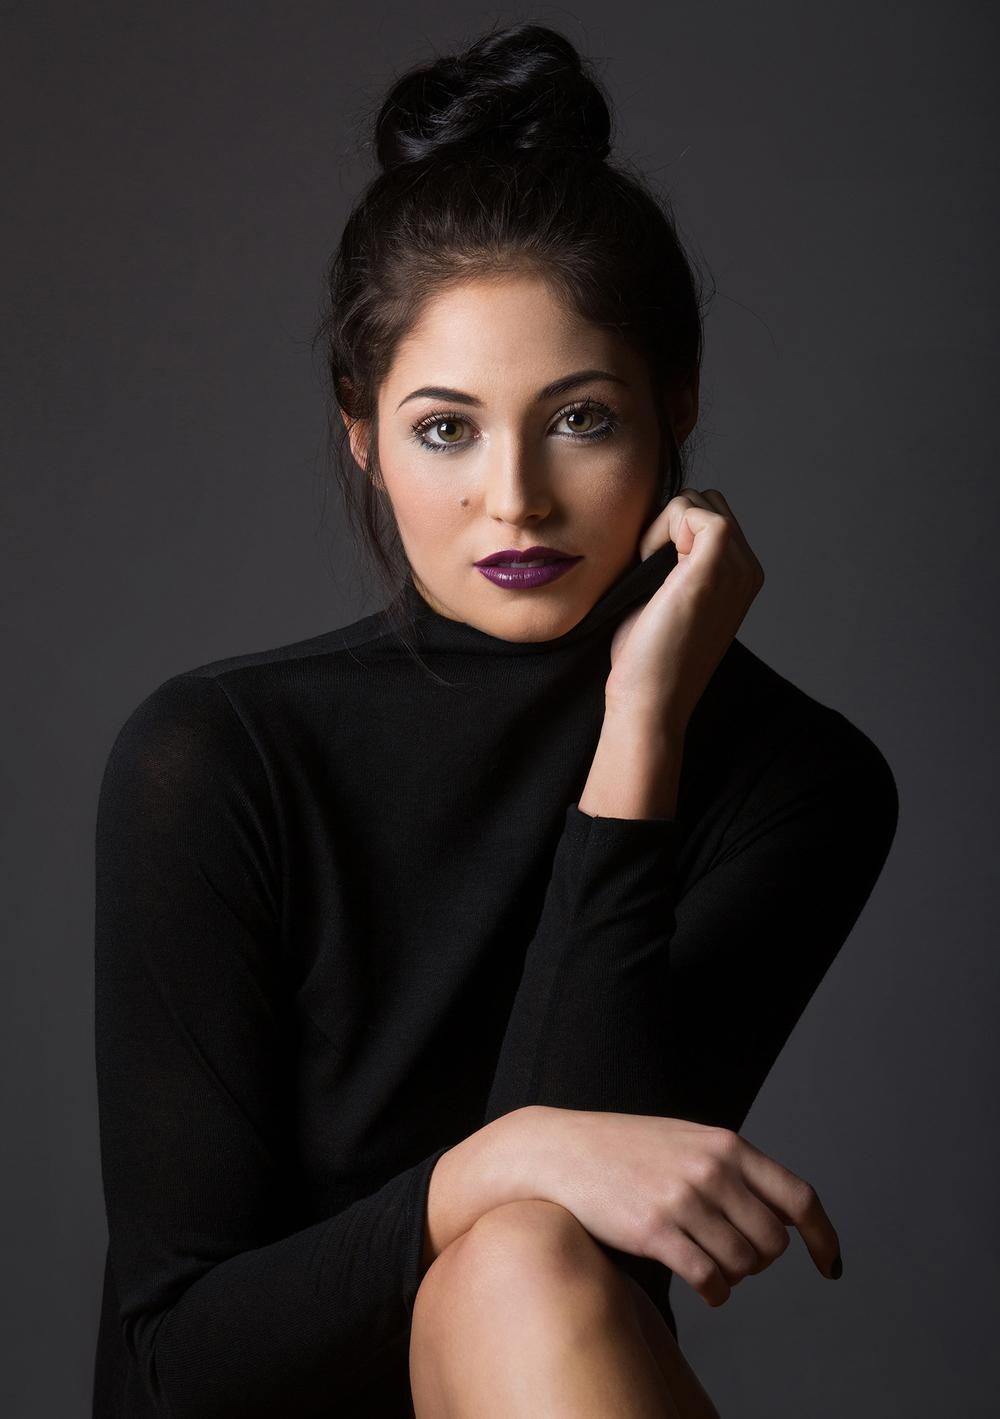 BeautyPhotography_BlackAndWhite_MichelleGirardPhotography01.jpg